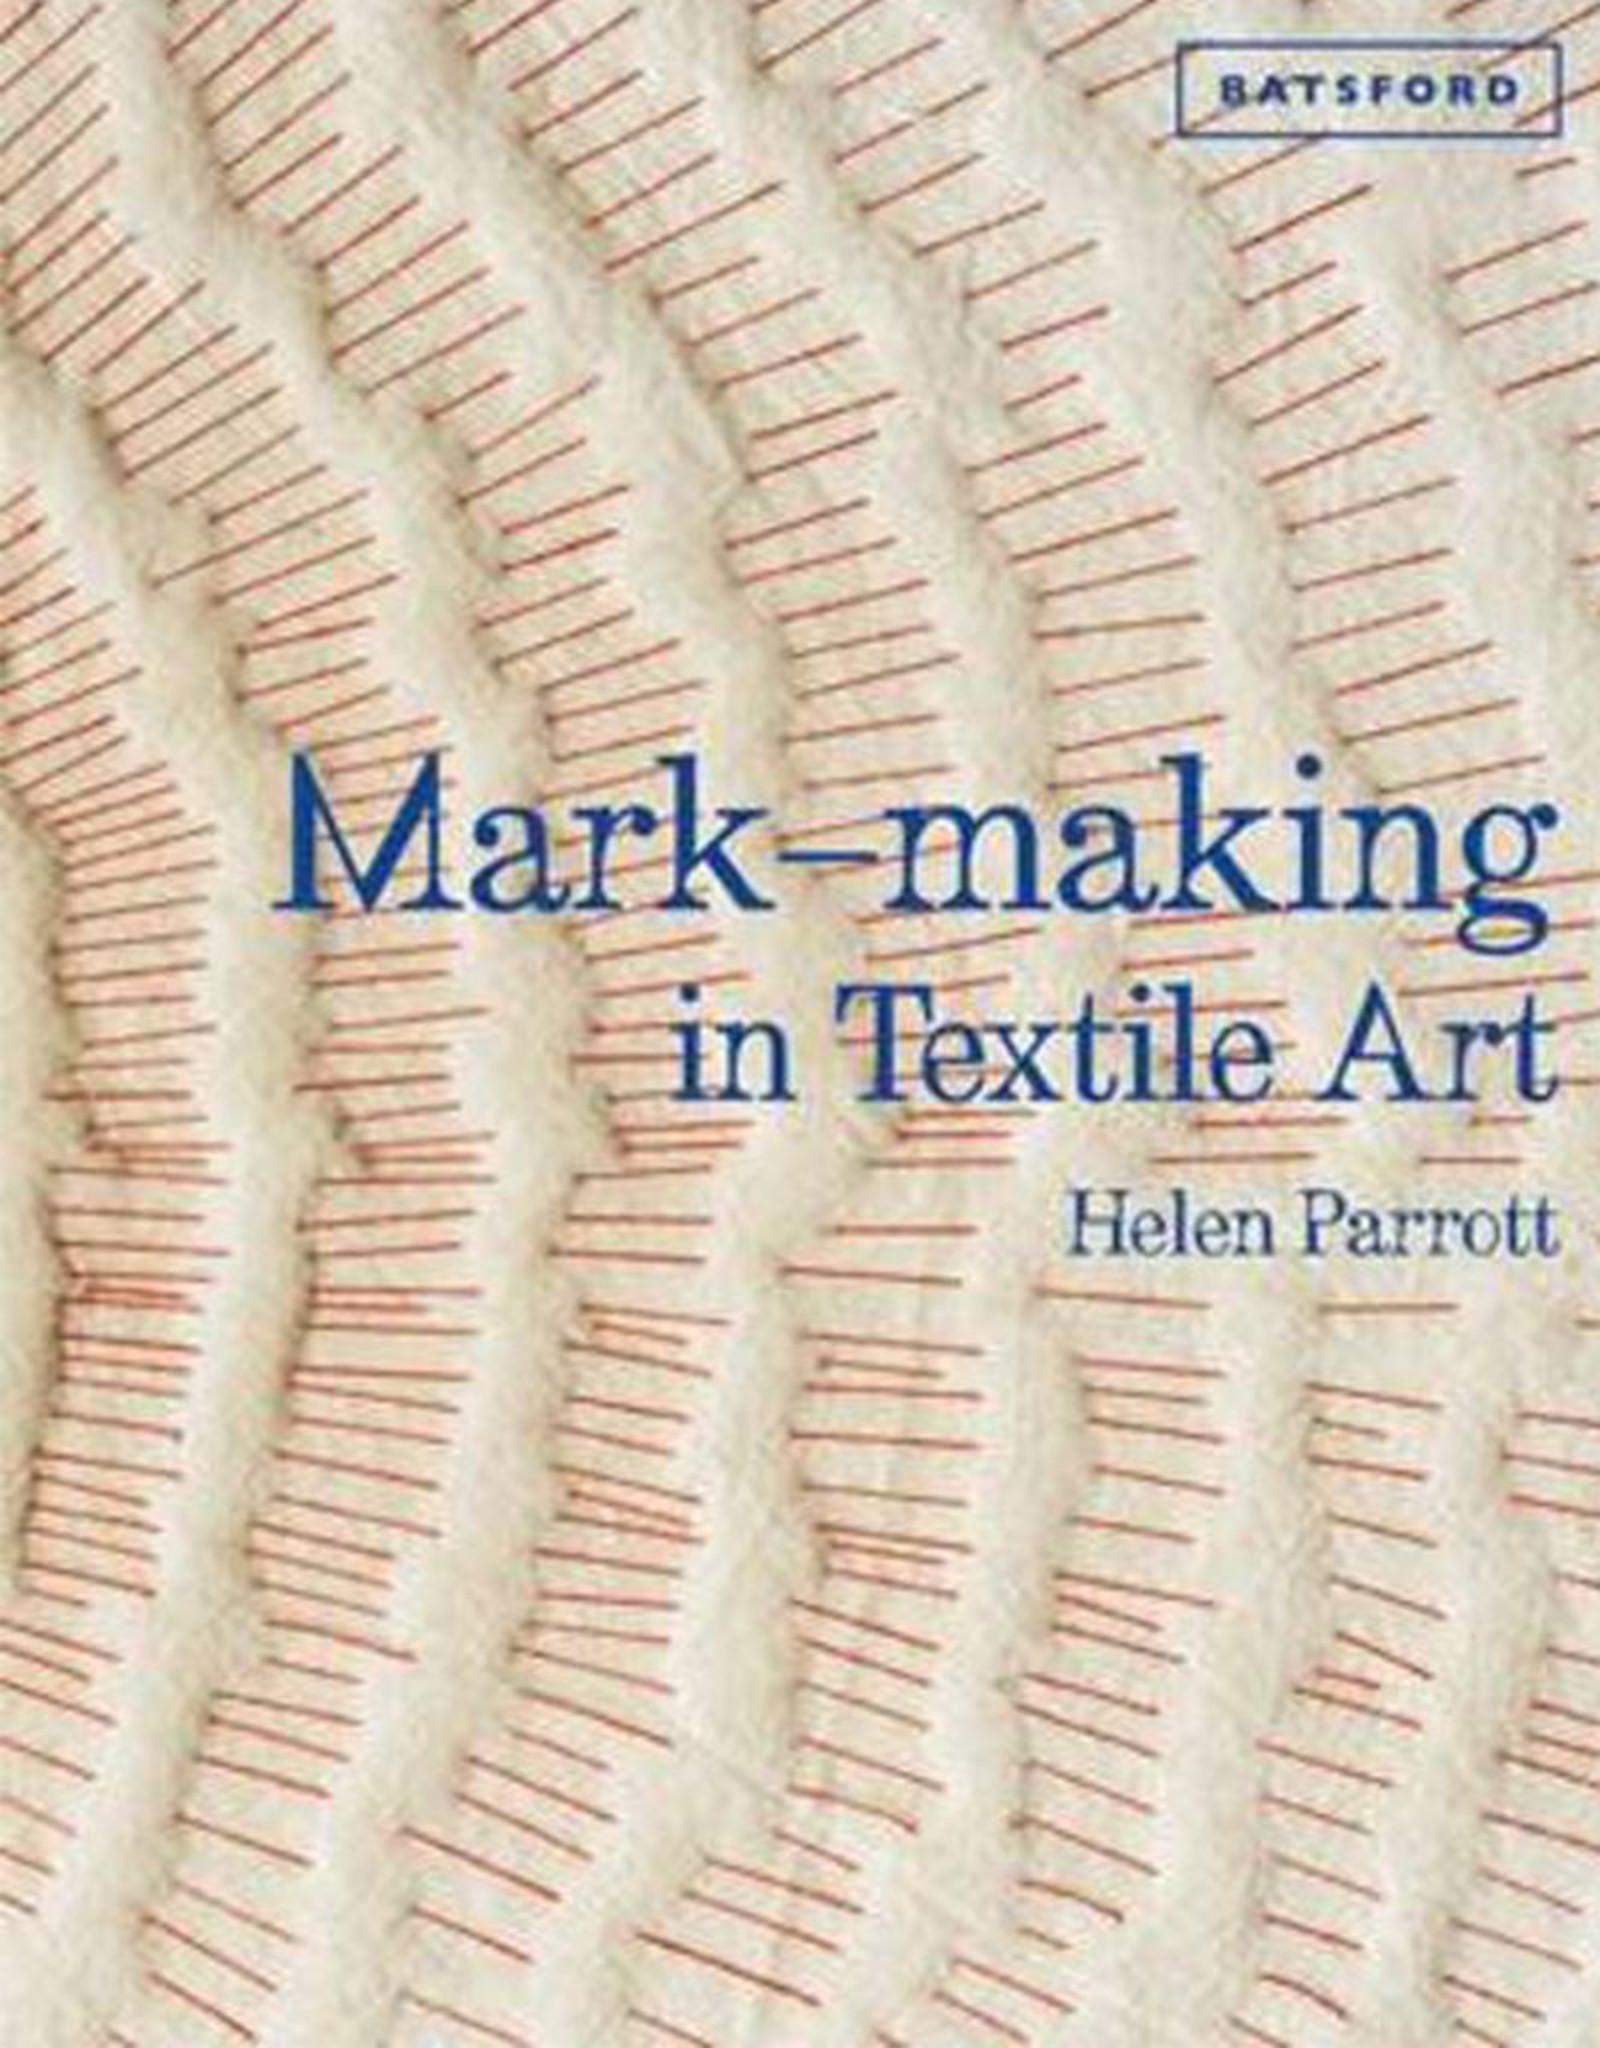 Mark Making in Textile Art / Helen Parrott